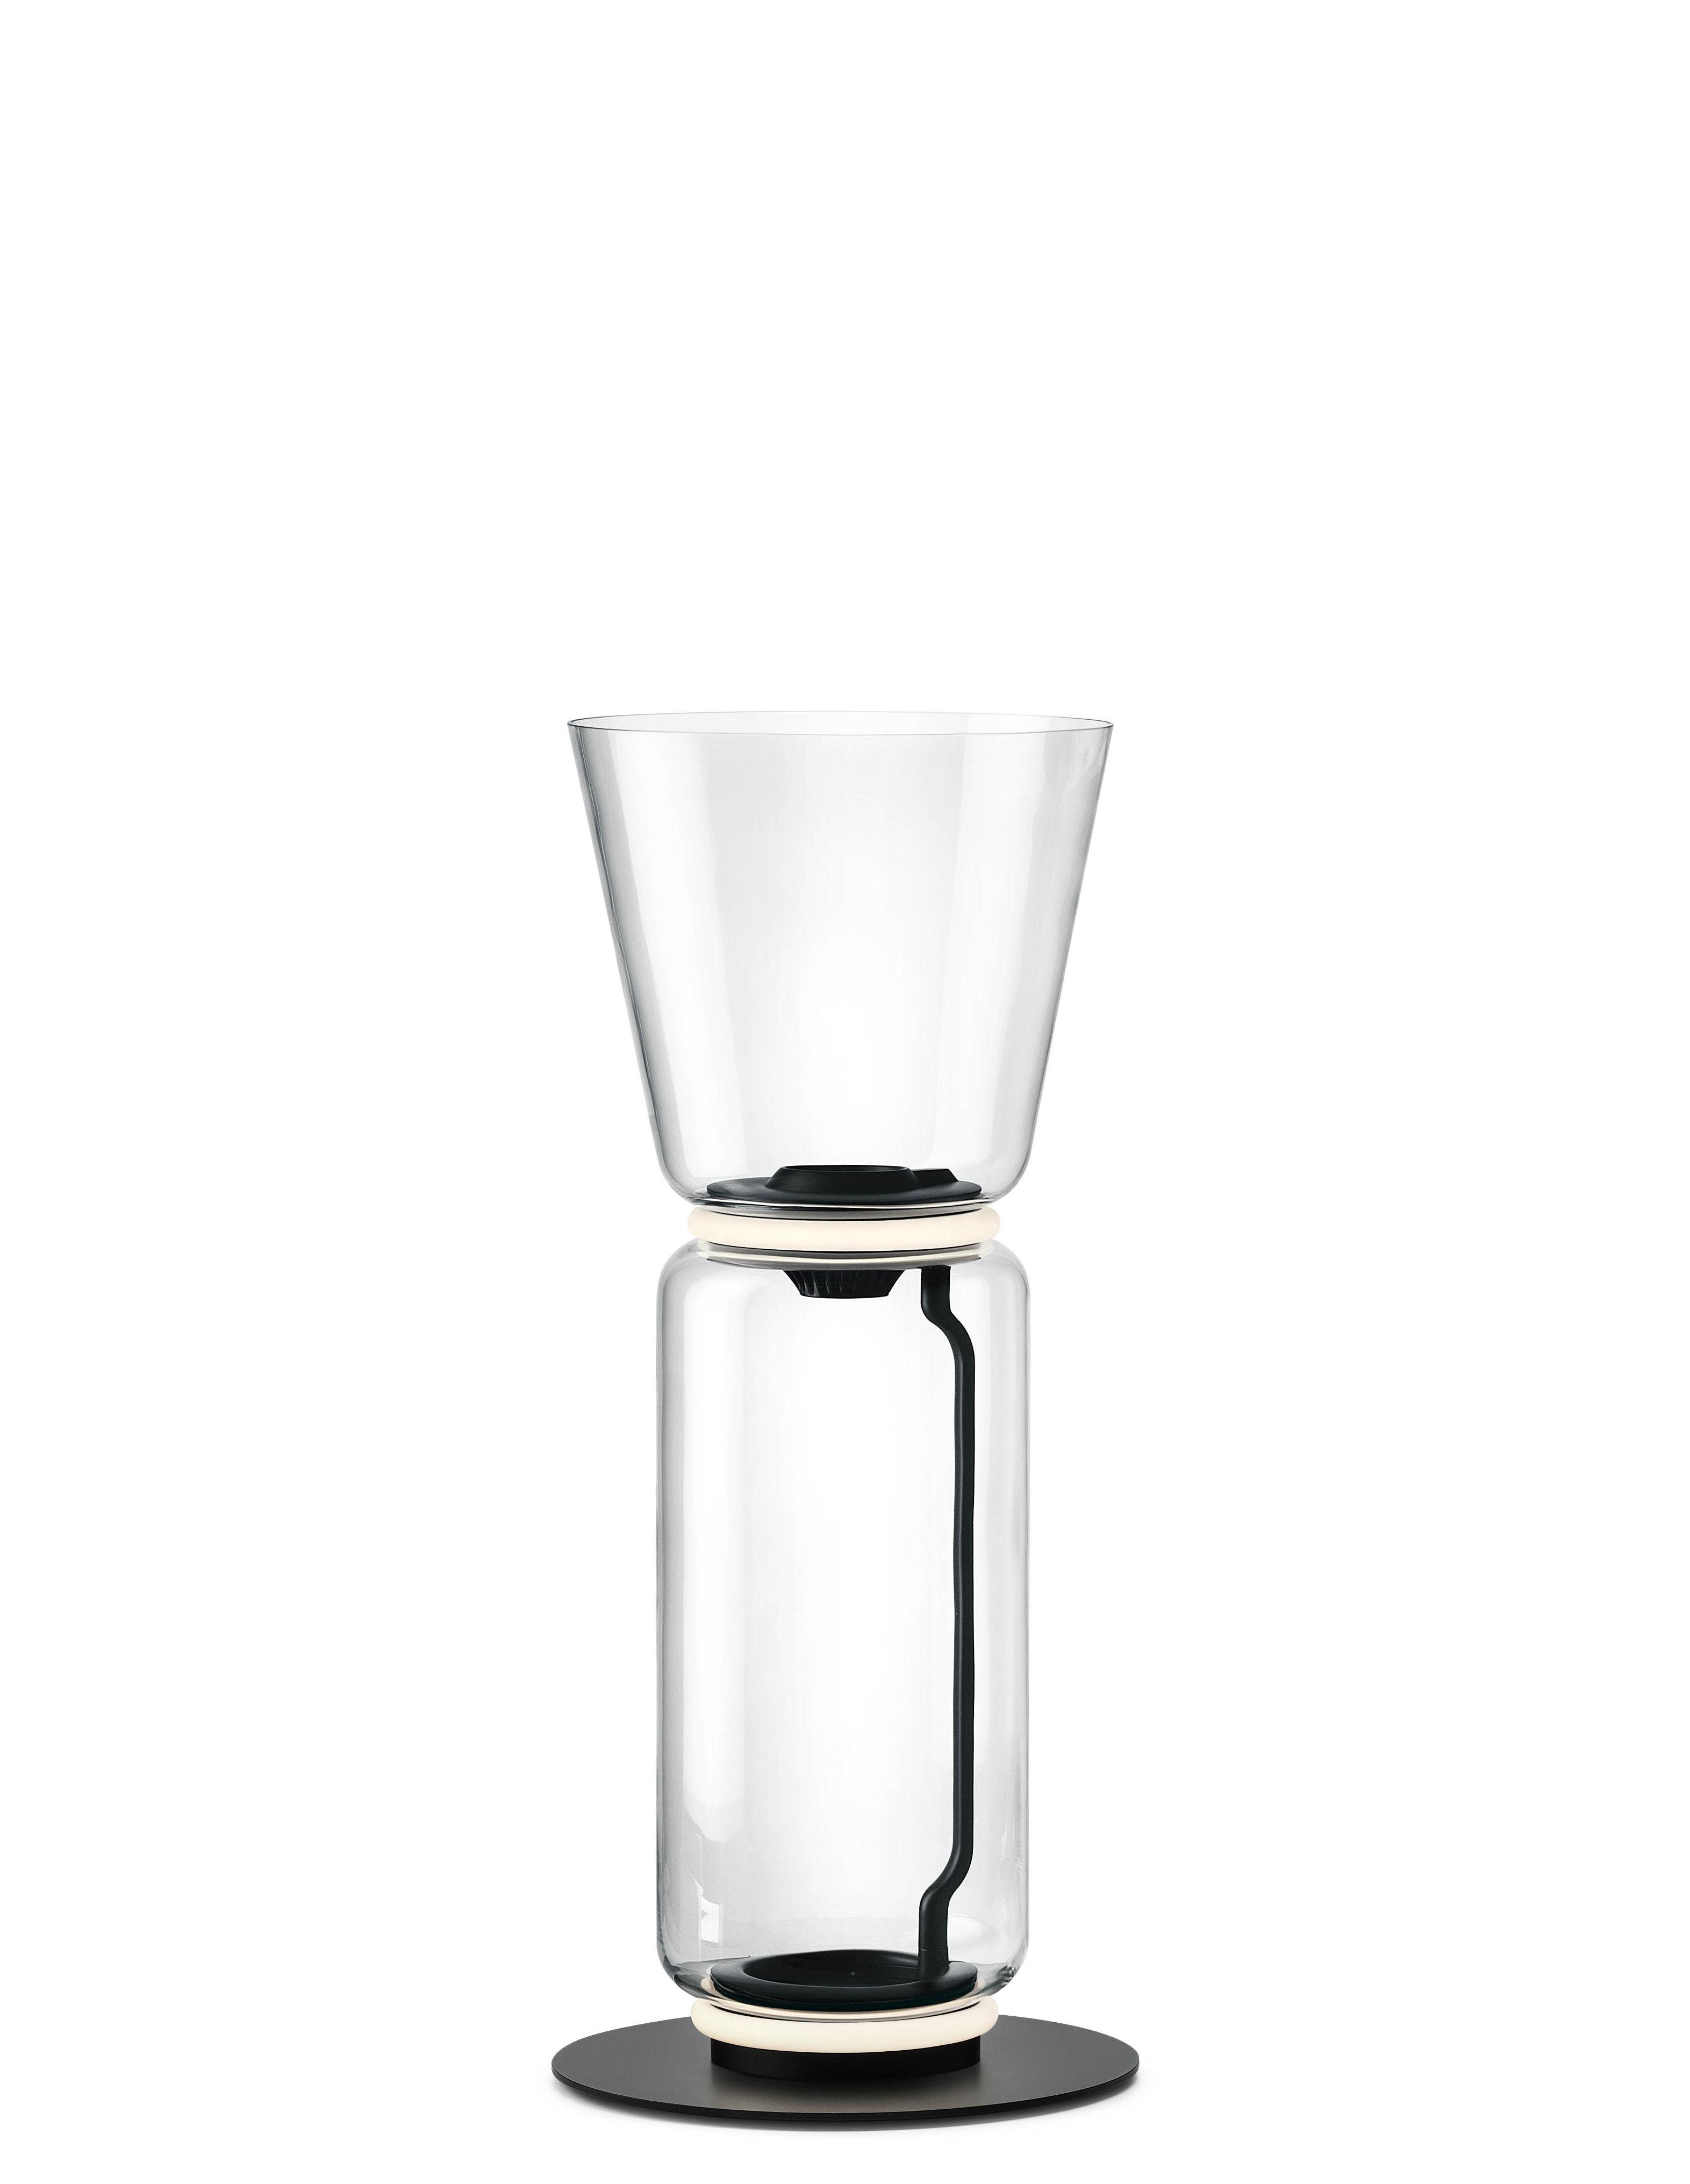 Leuchten - Stehleuchten - Noctambule Cône n°1 Bodenleuchte / LED - Ø 36 x H 91 cm - Flos - H 91 cm / Transparent - geblasenes Glas, Gussaluminium, Stahl